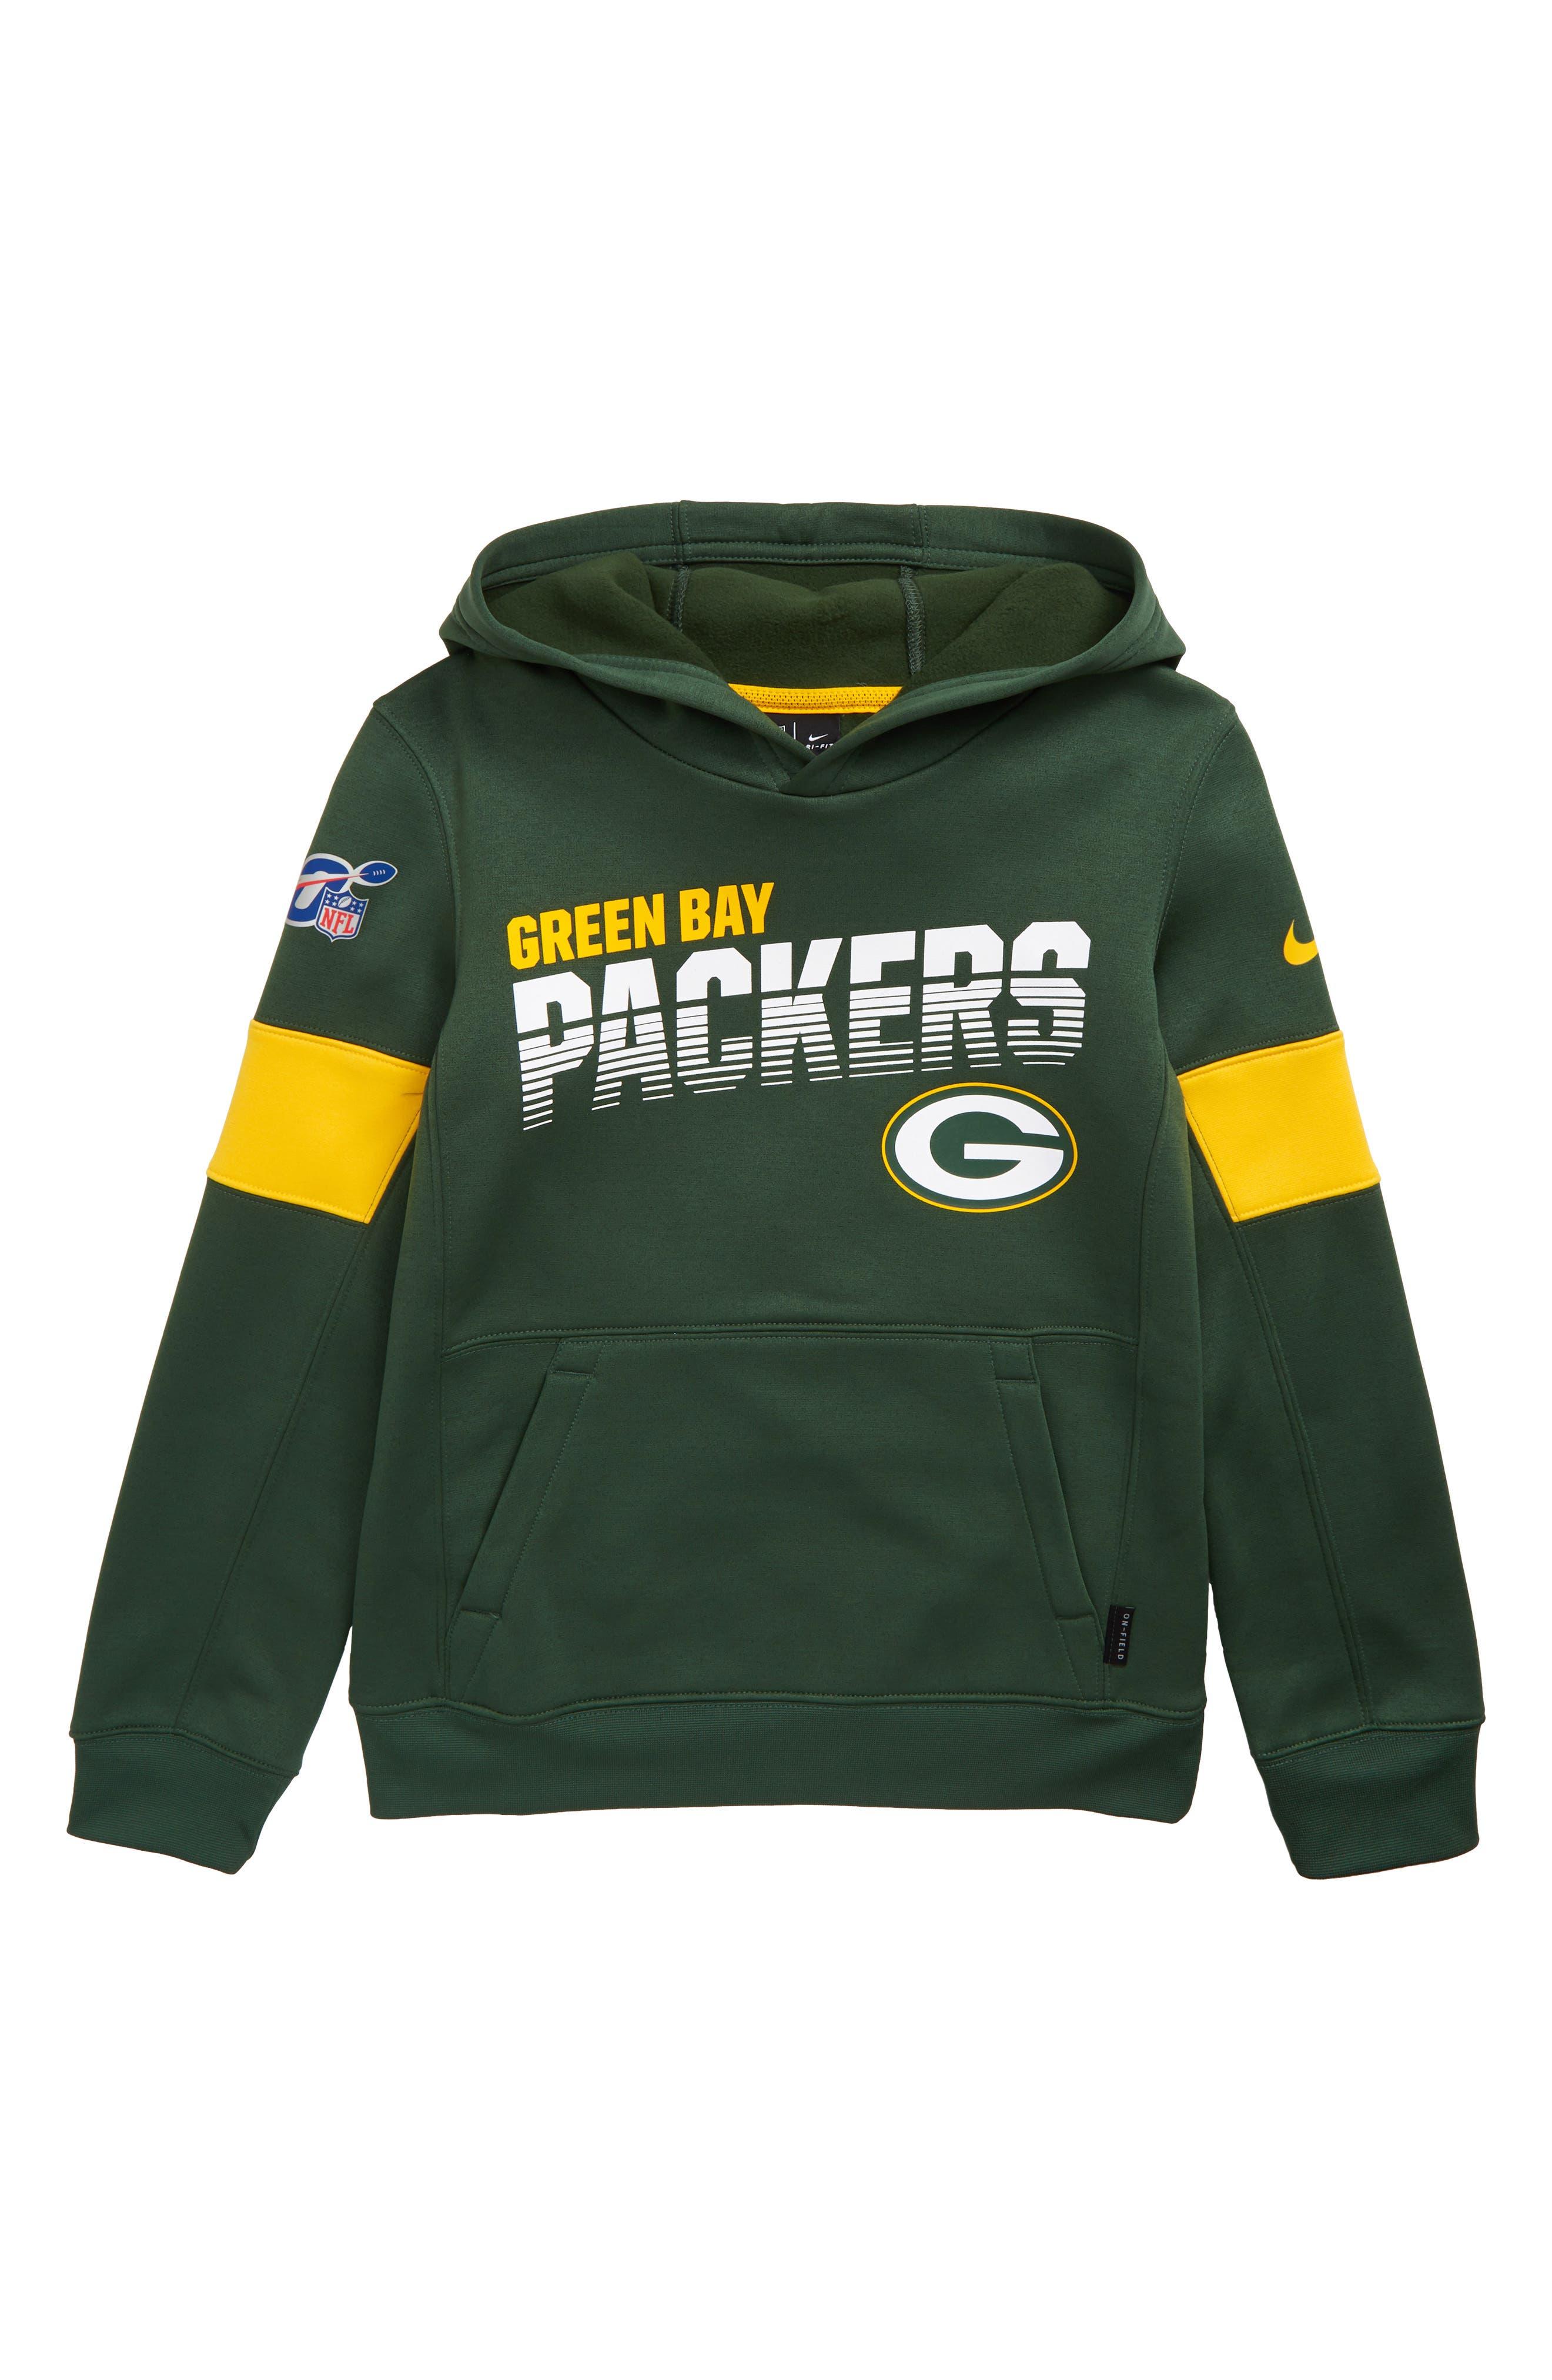 boys green bay packer sweatshirt